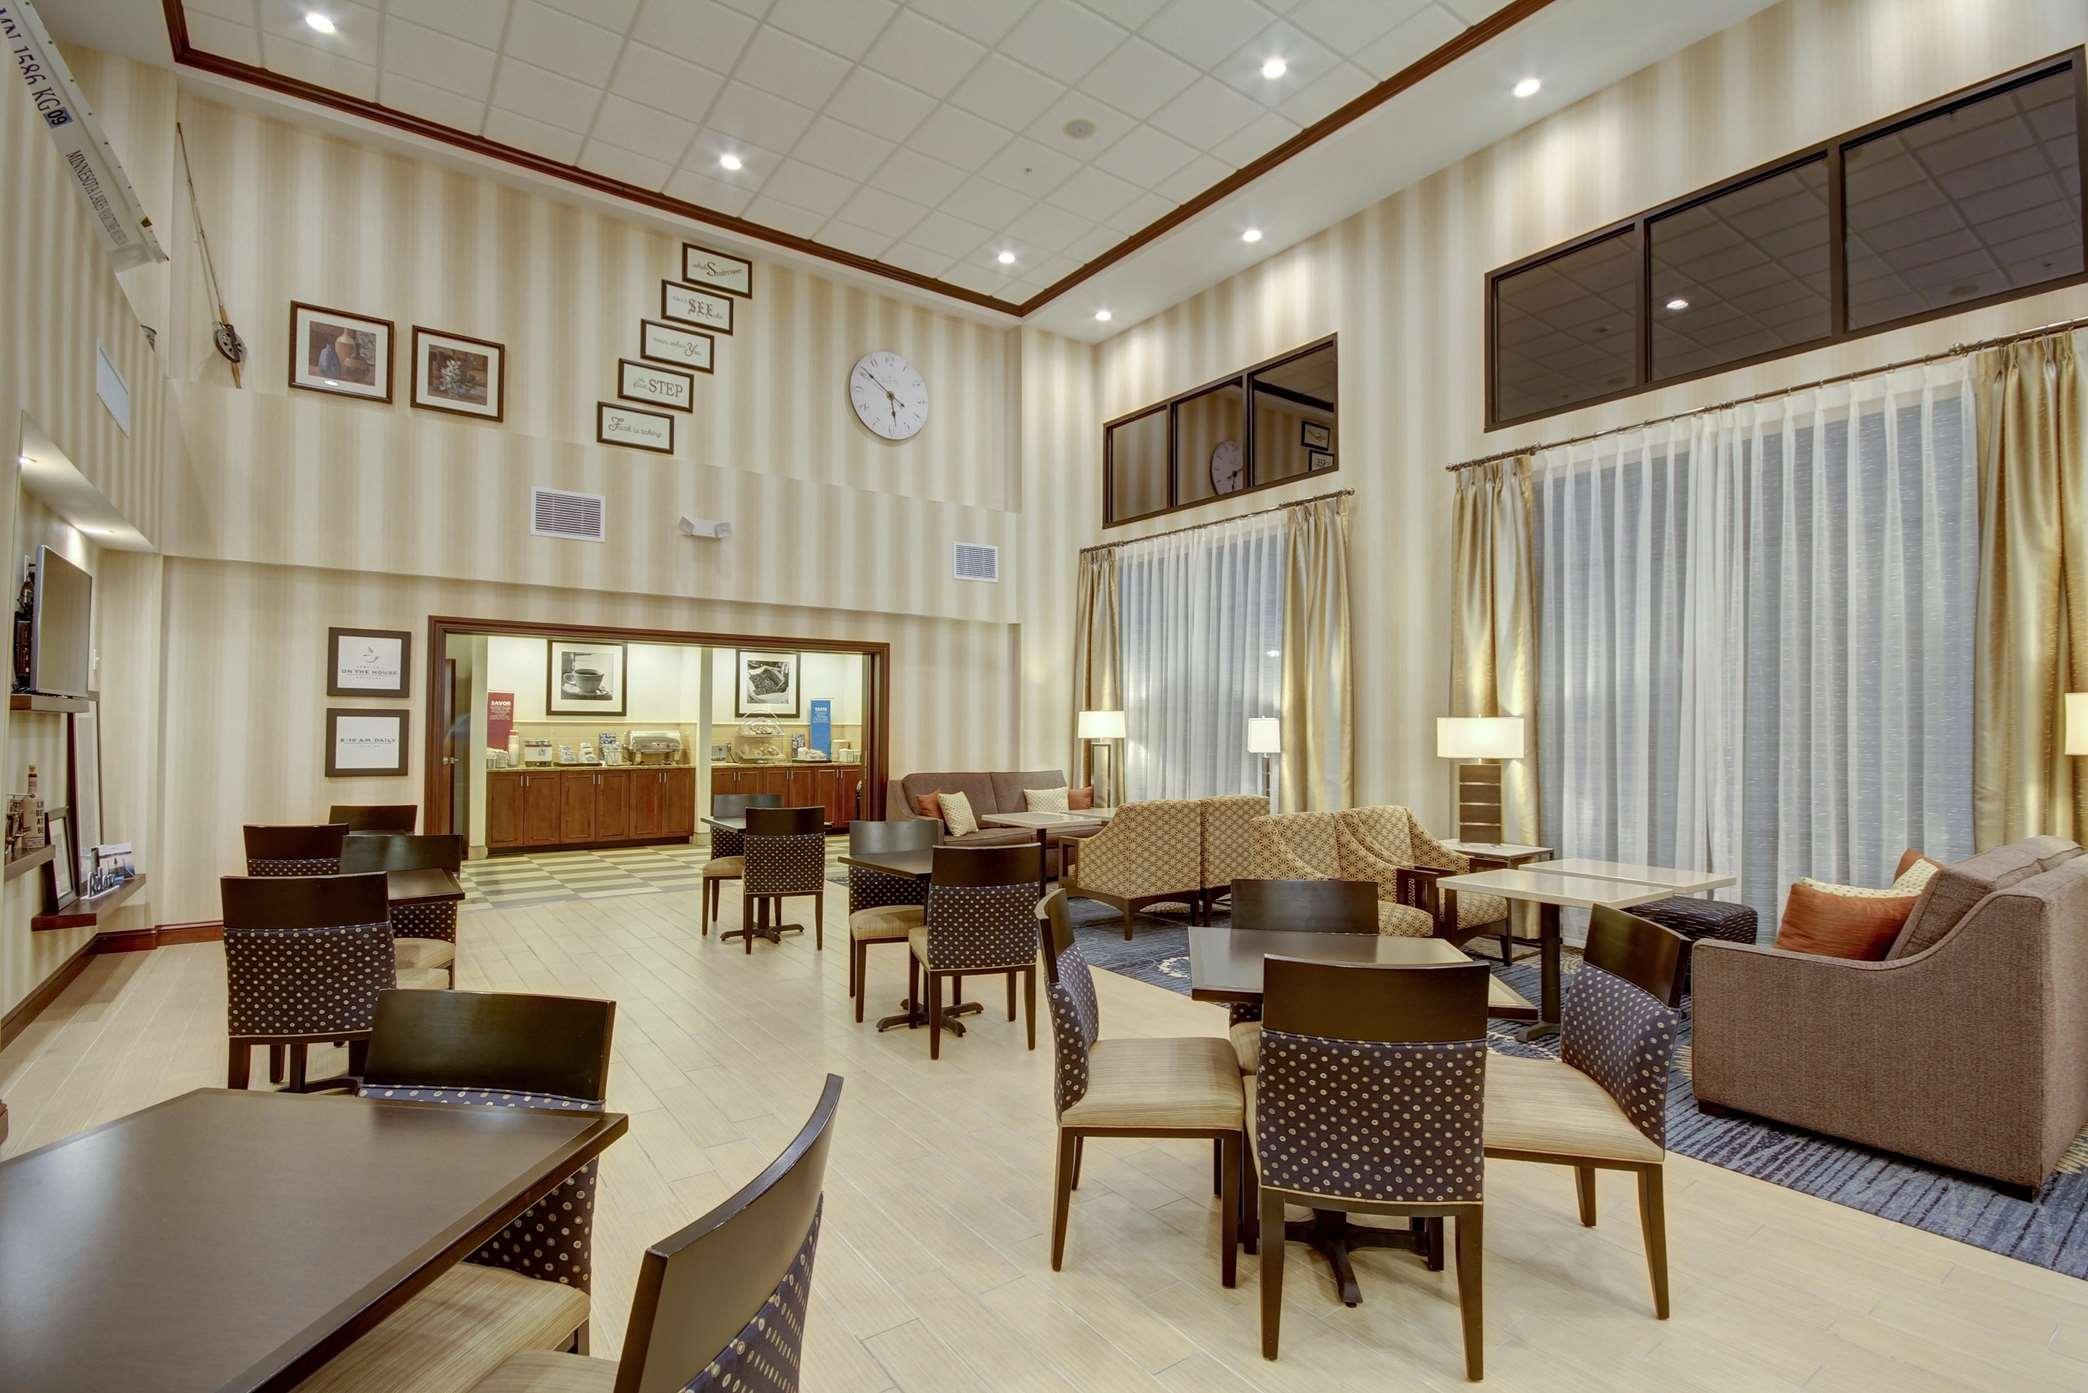 Hampton Inn & Suites Alexandria image 43